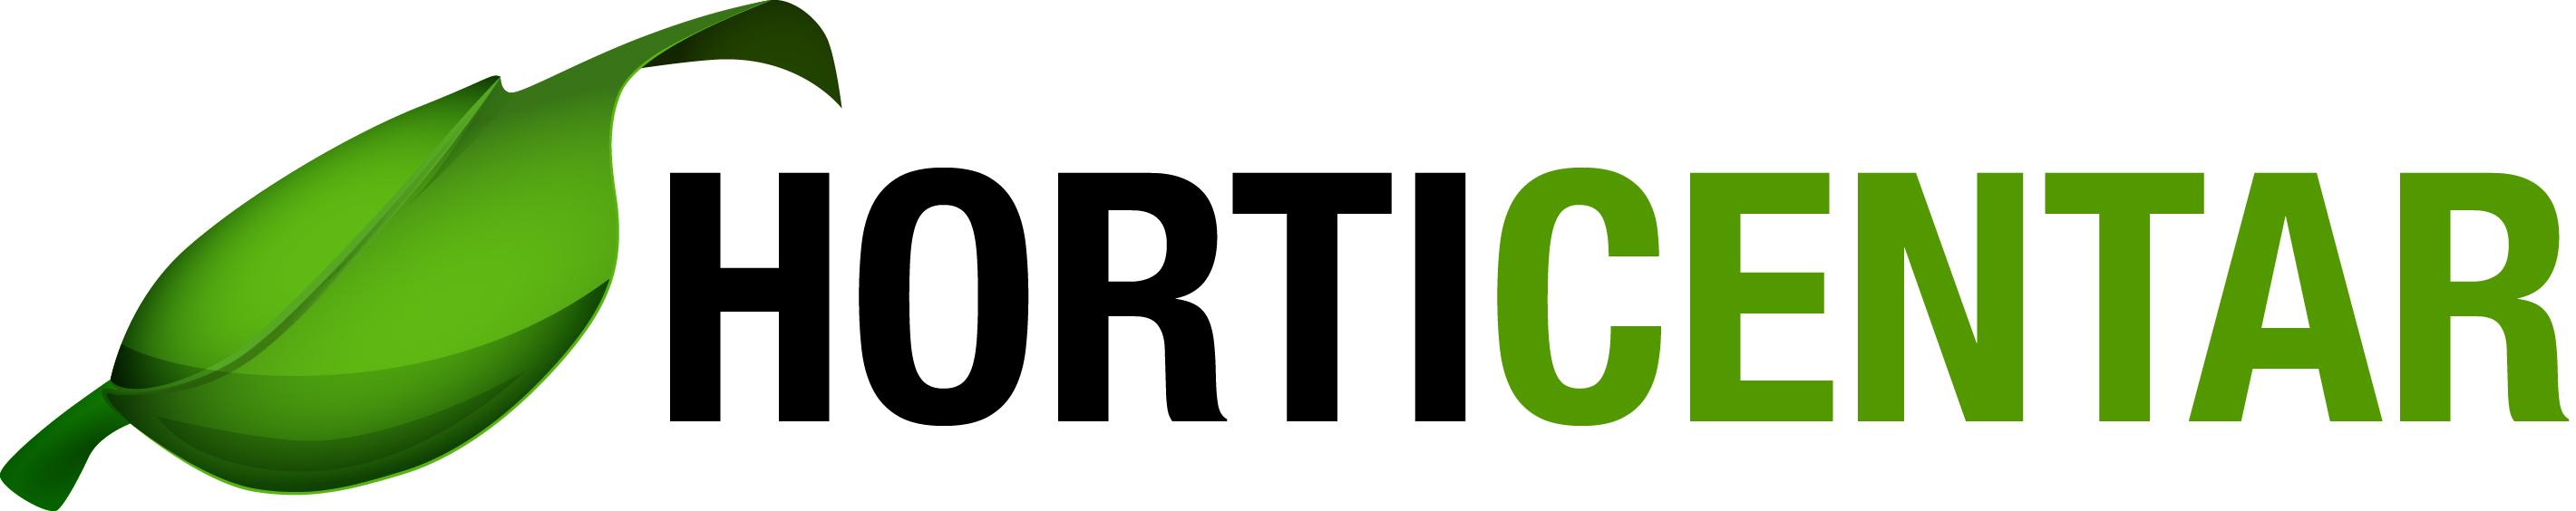 Horticentar Adria Web Shop